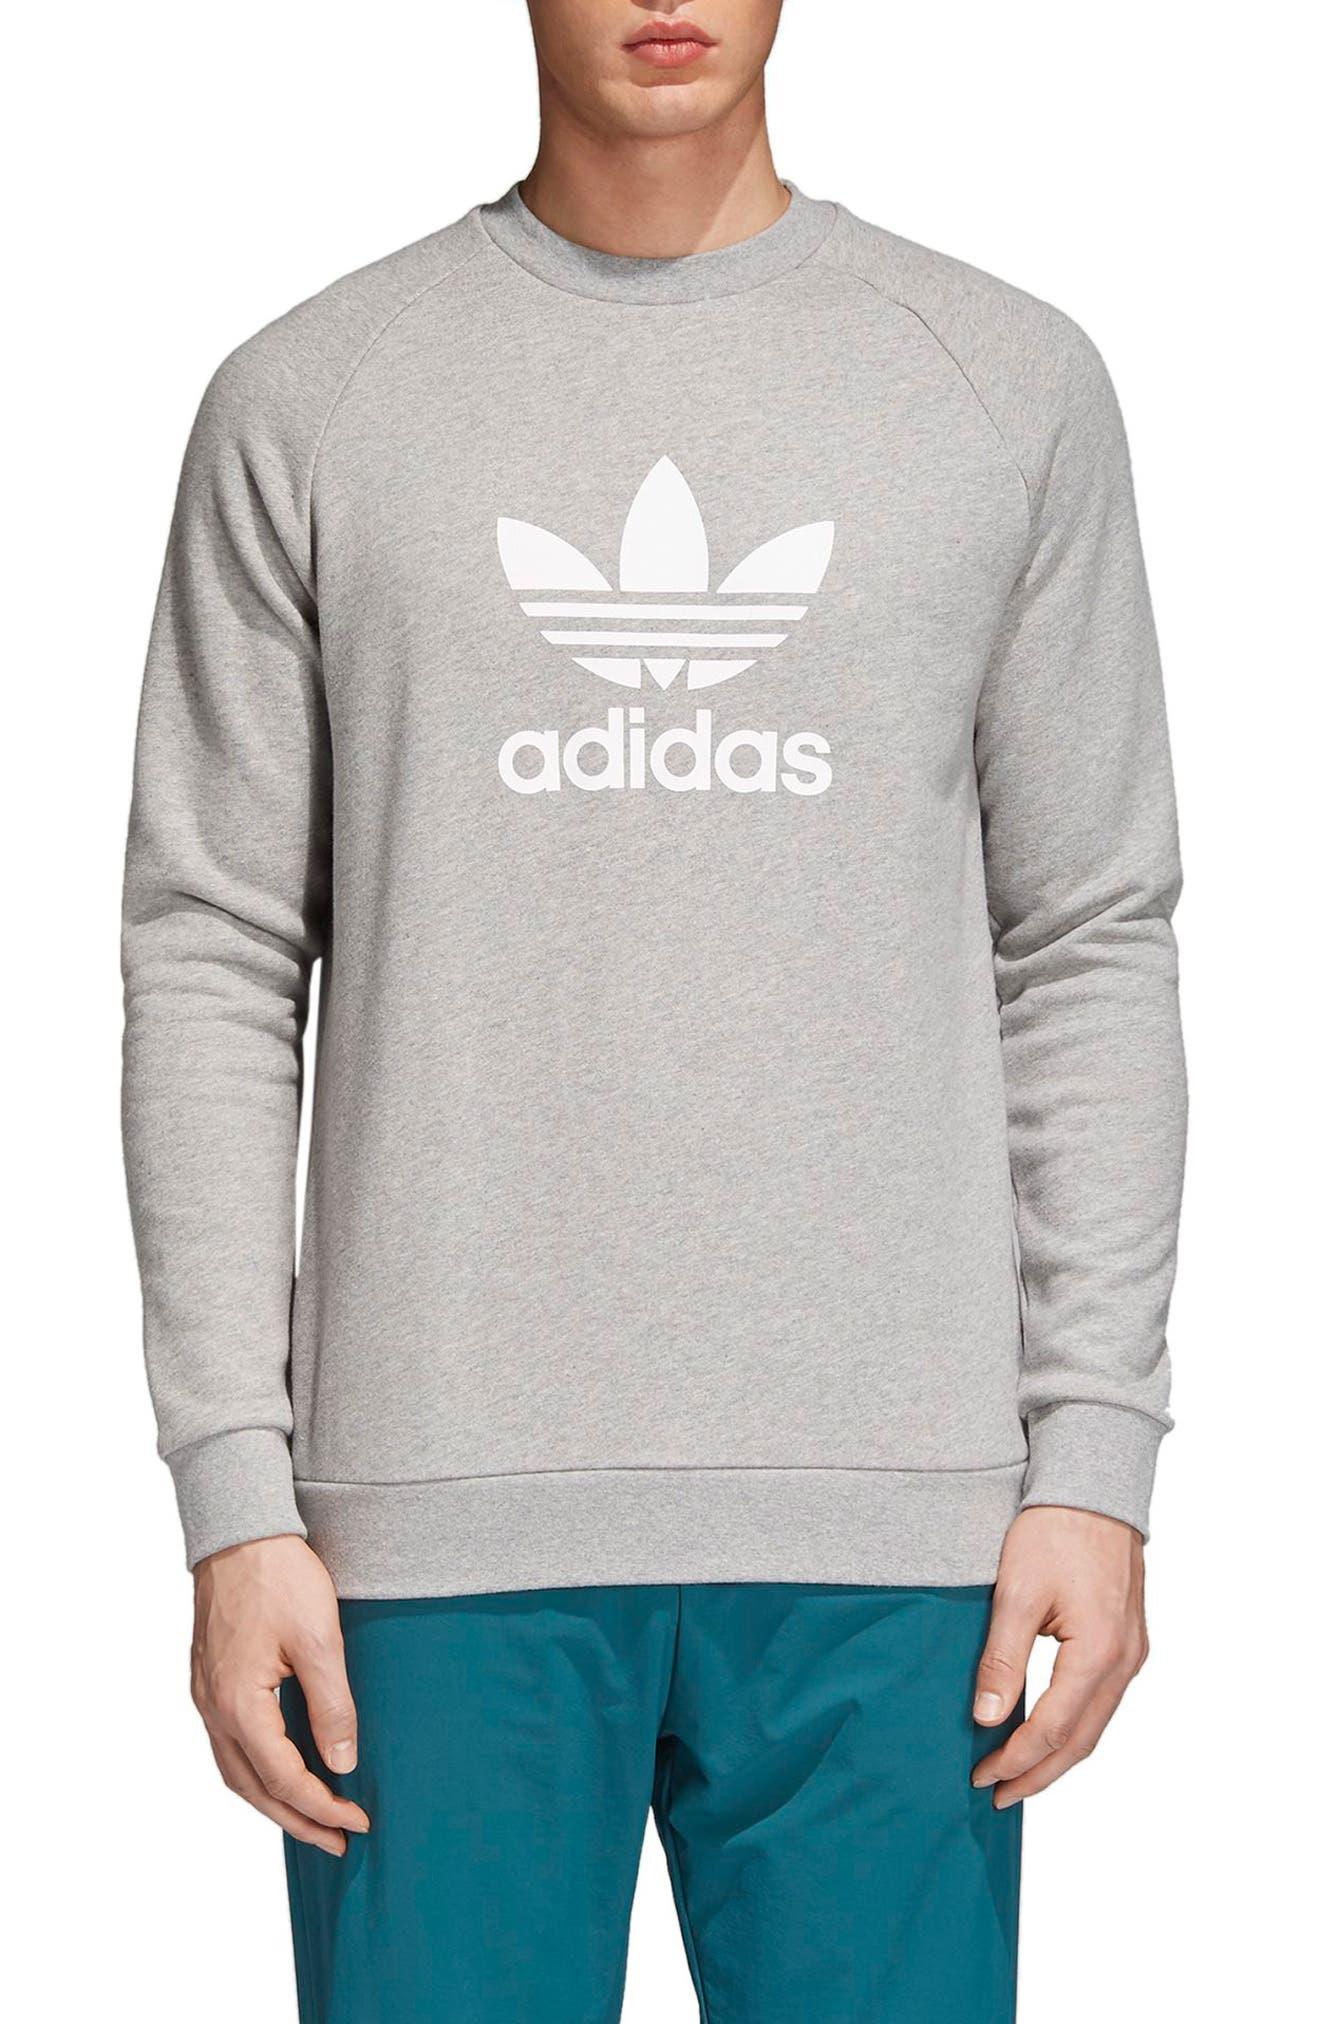 adidas Trefoil Crewneck Sweatshirt,                         Main,                         color, 035